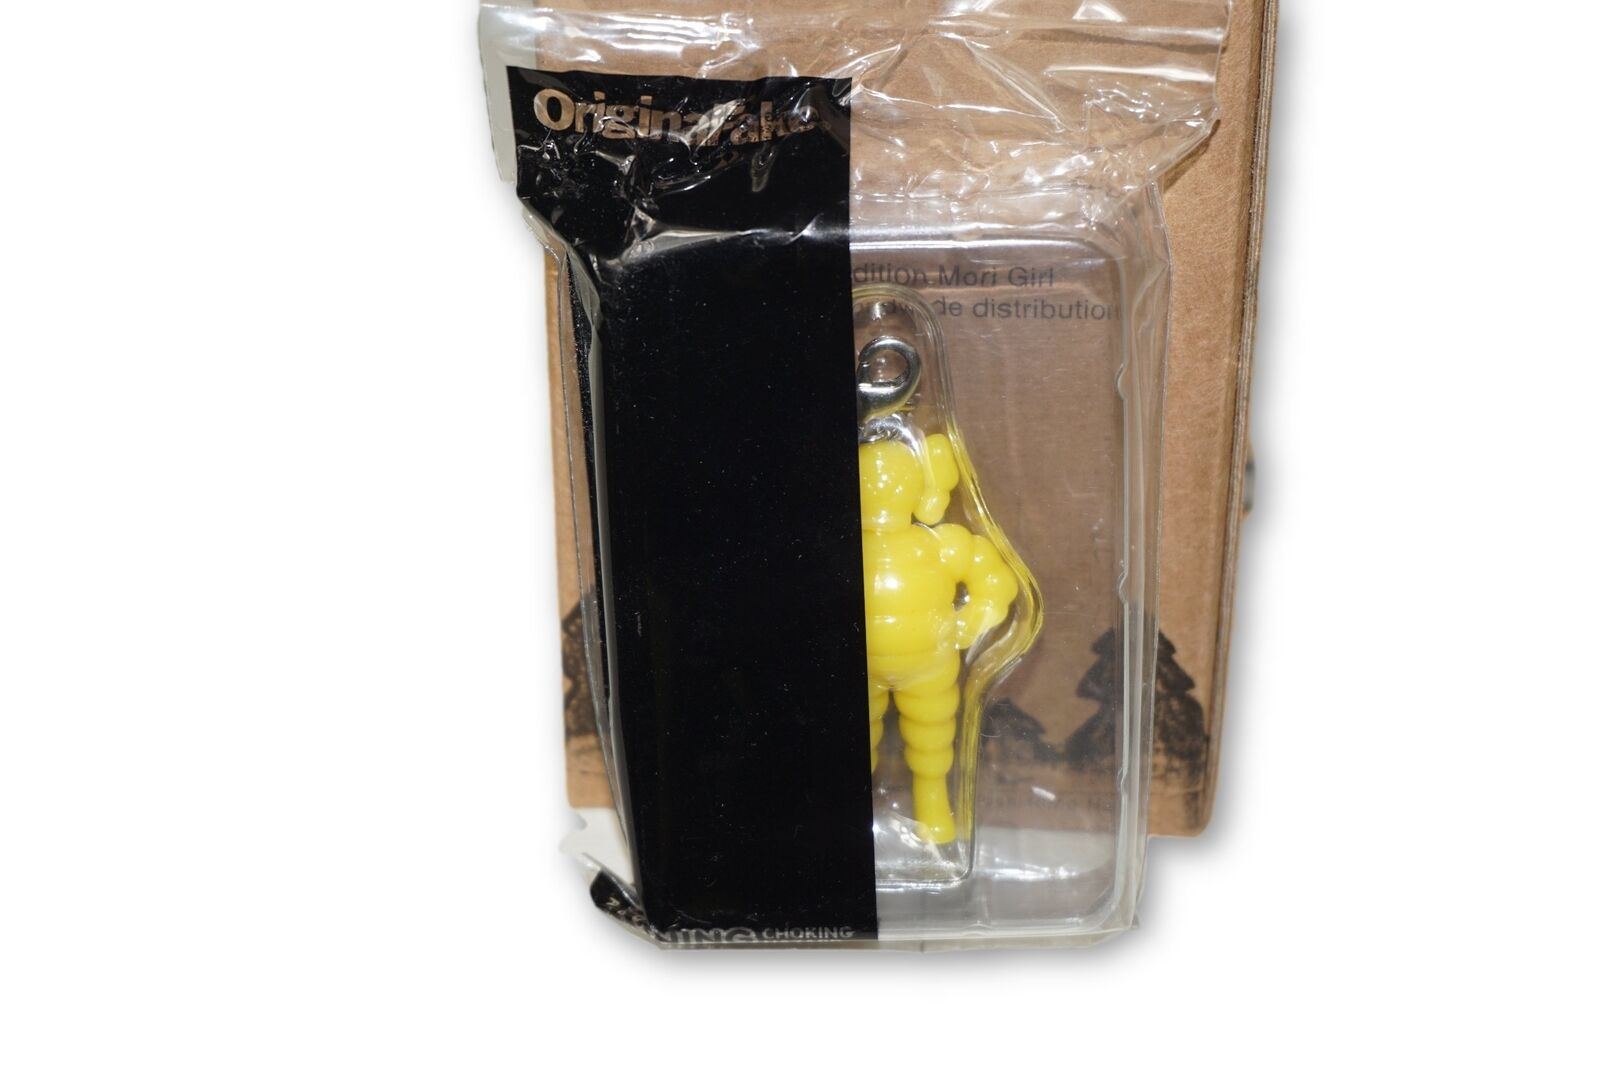 ec2e0297 kaws OriginalFake X Medicom 'chum (yellow) 2009 Keychain for sale ...